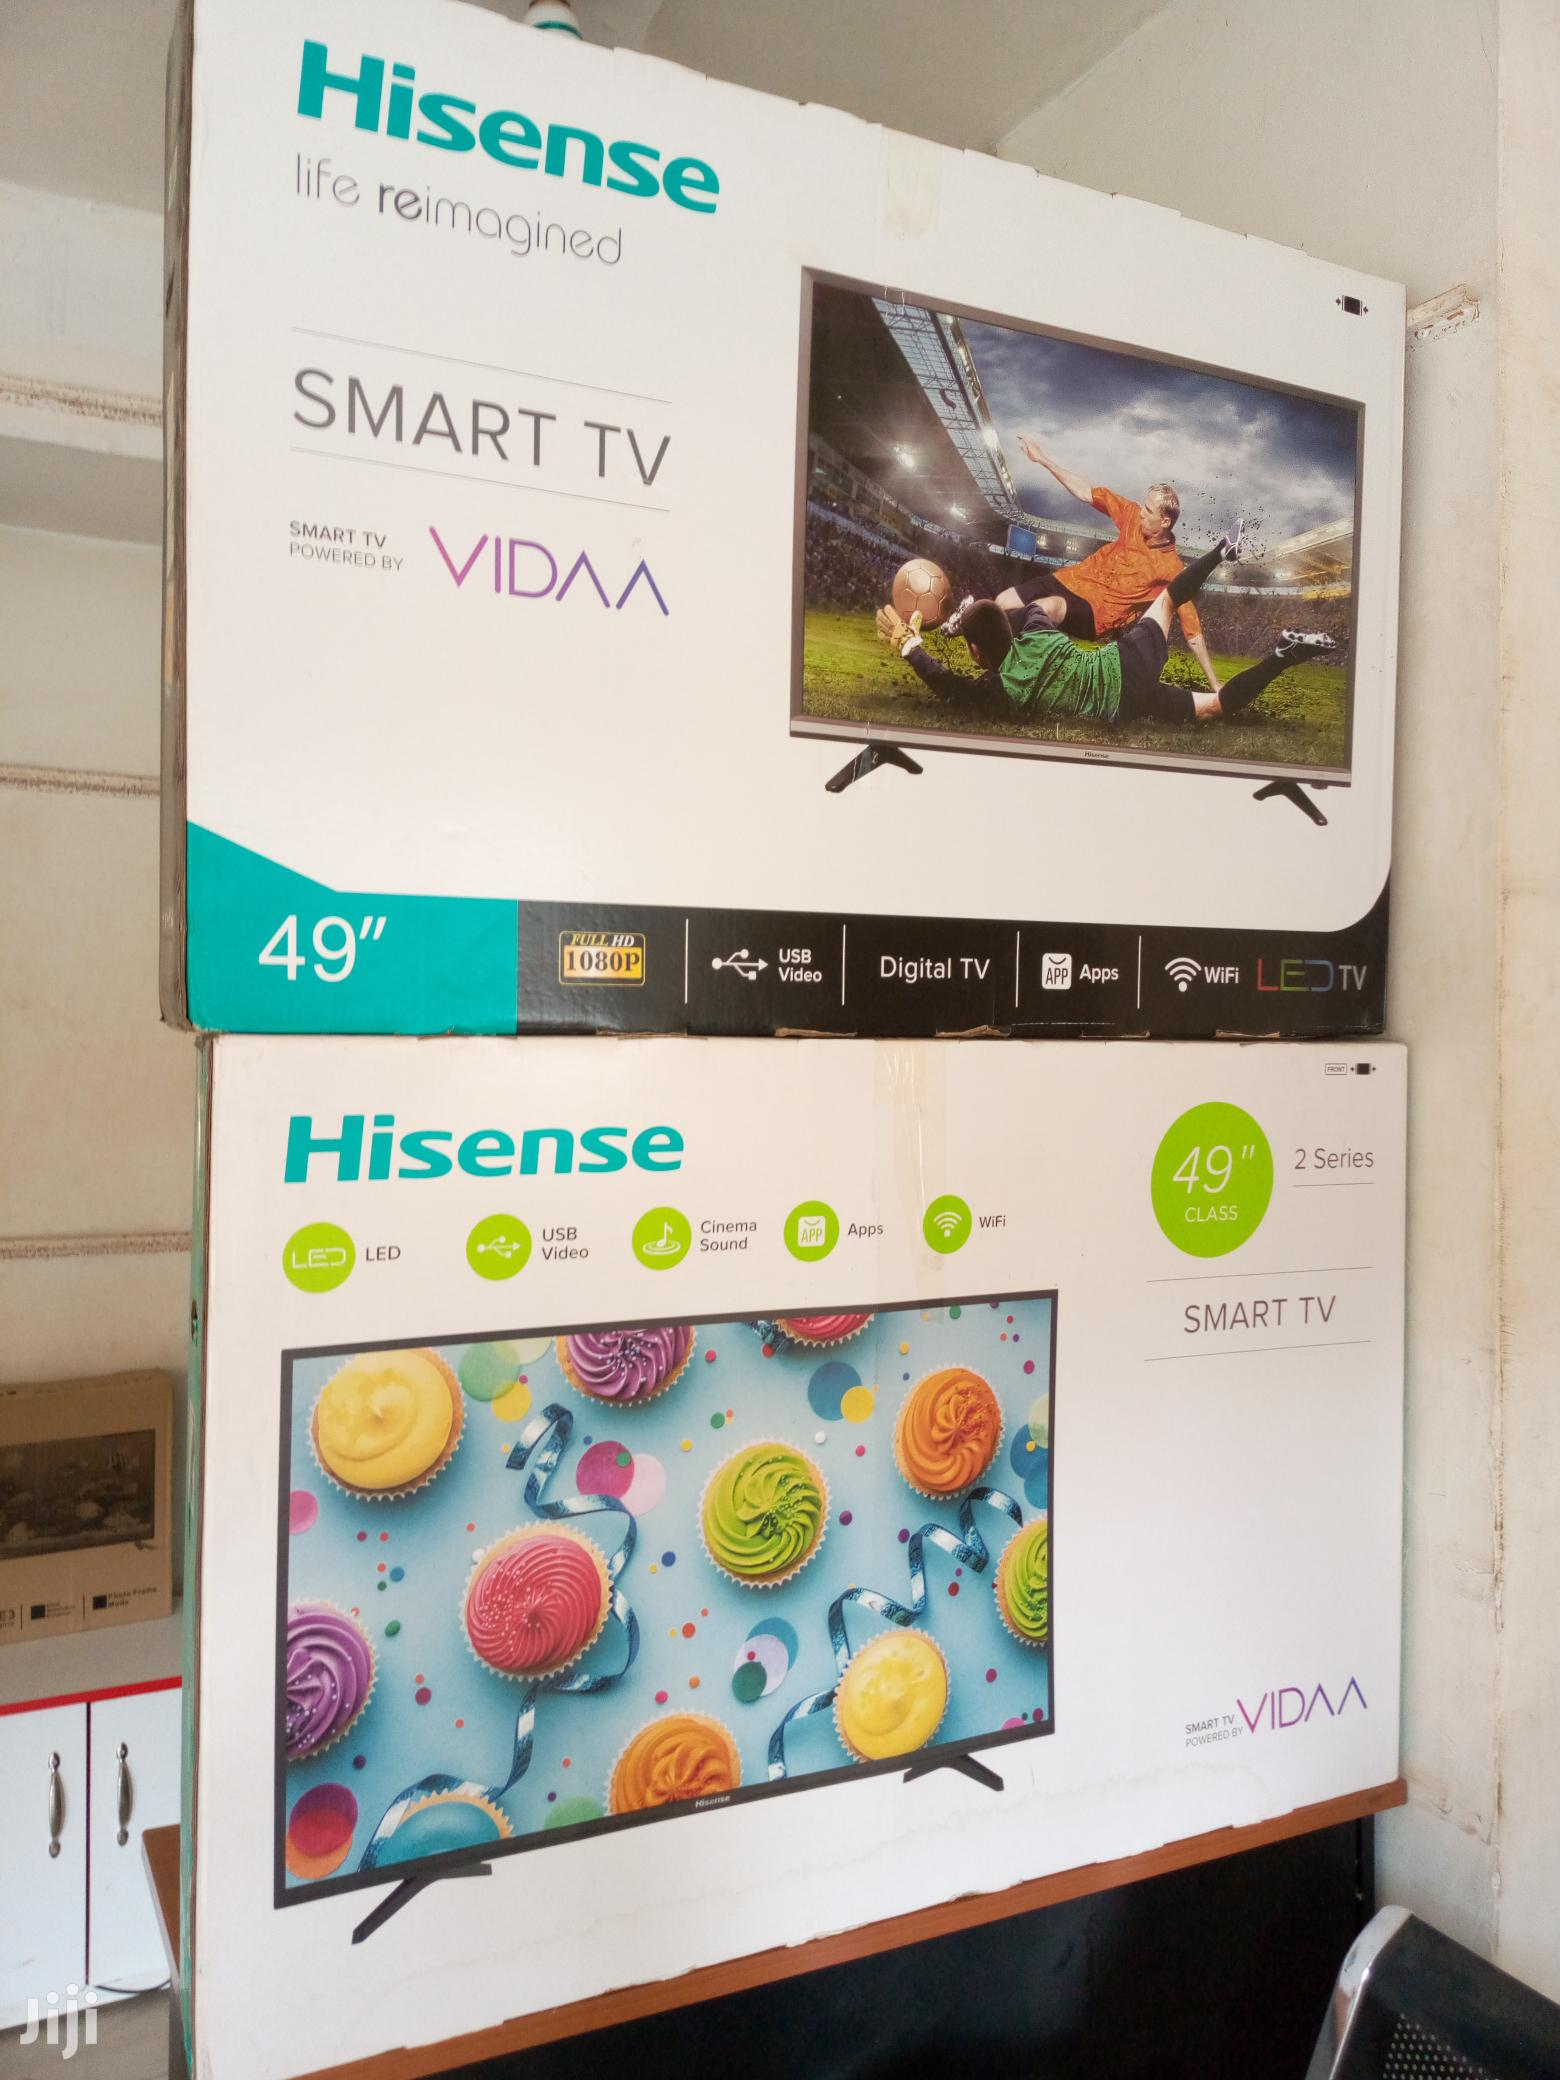 Hisense Smart Digital Satellite Full HD Led Flat Screen TV 49 Inches | TV & DVD Equipment for sale in Kampala, Central Region, Uganda